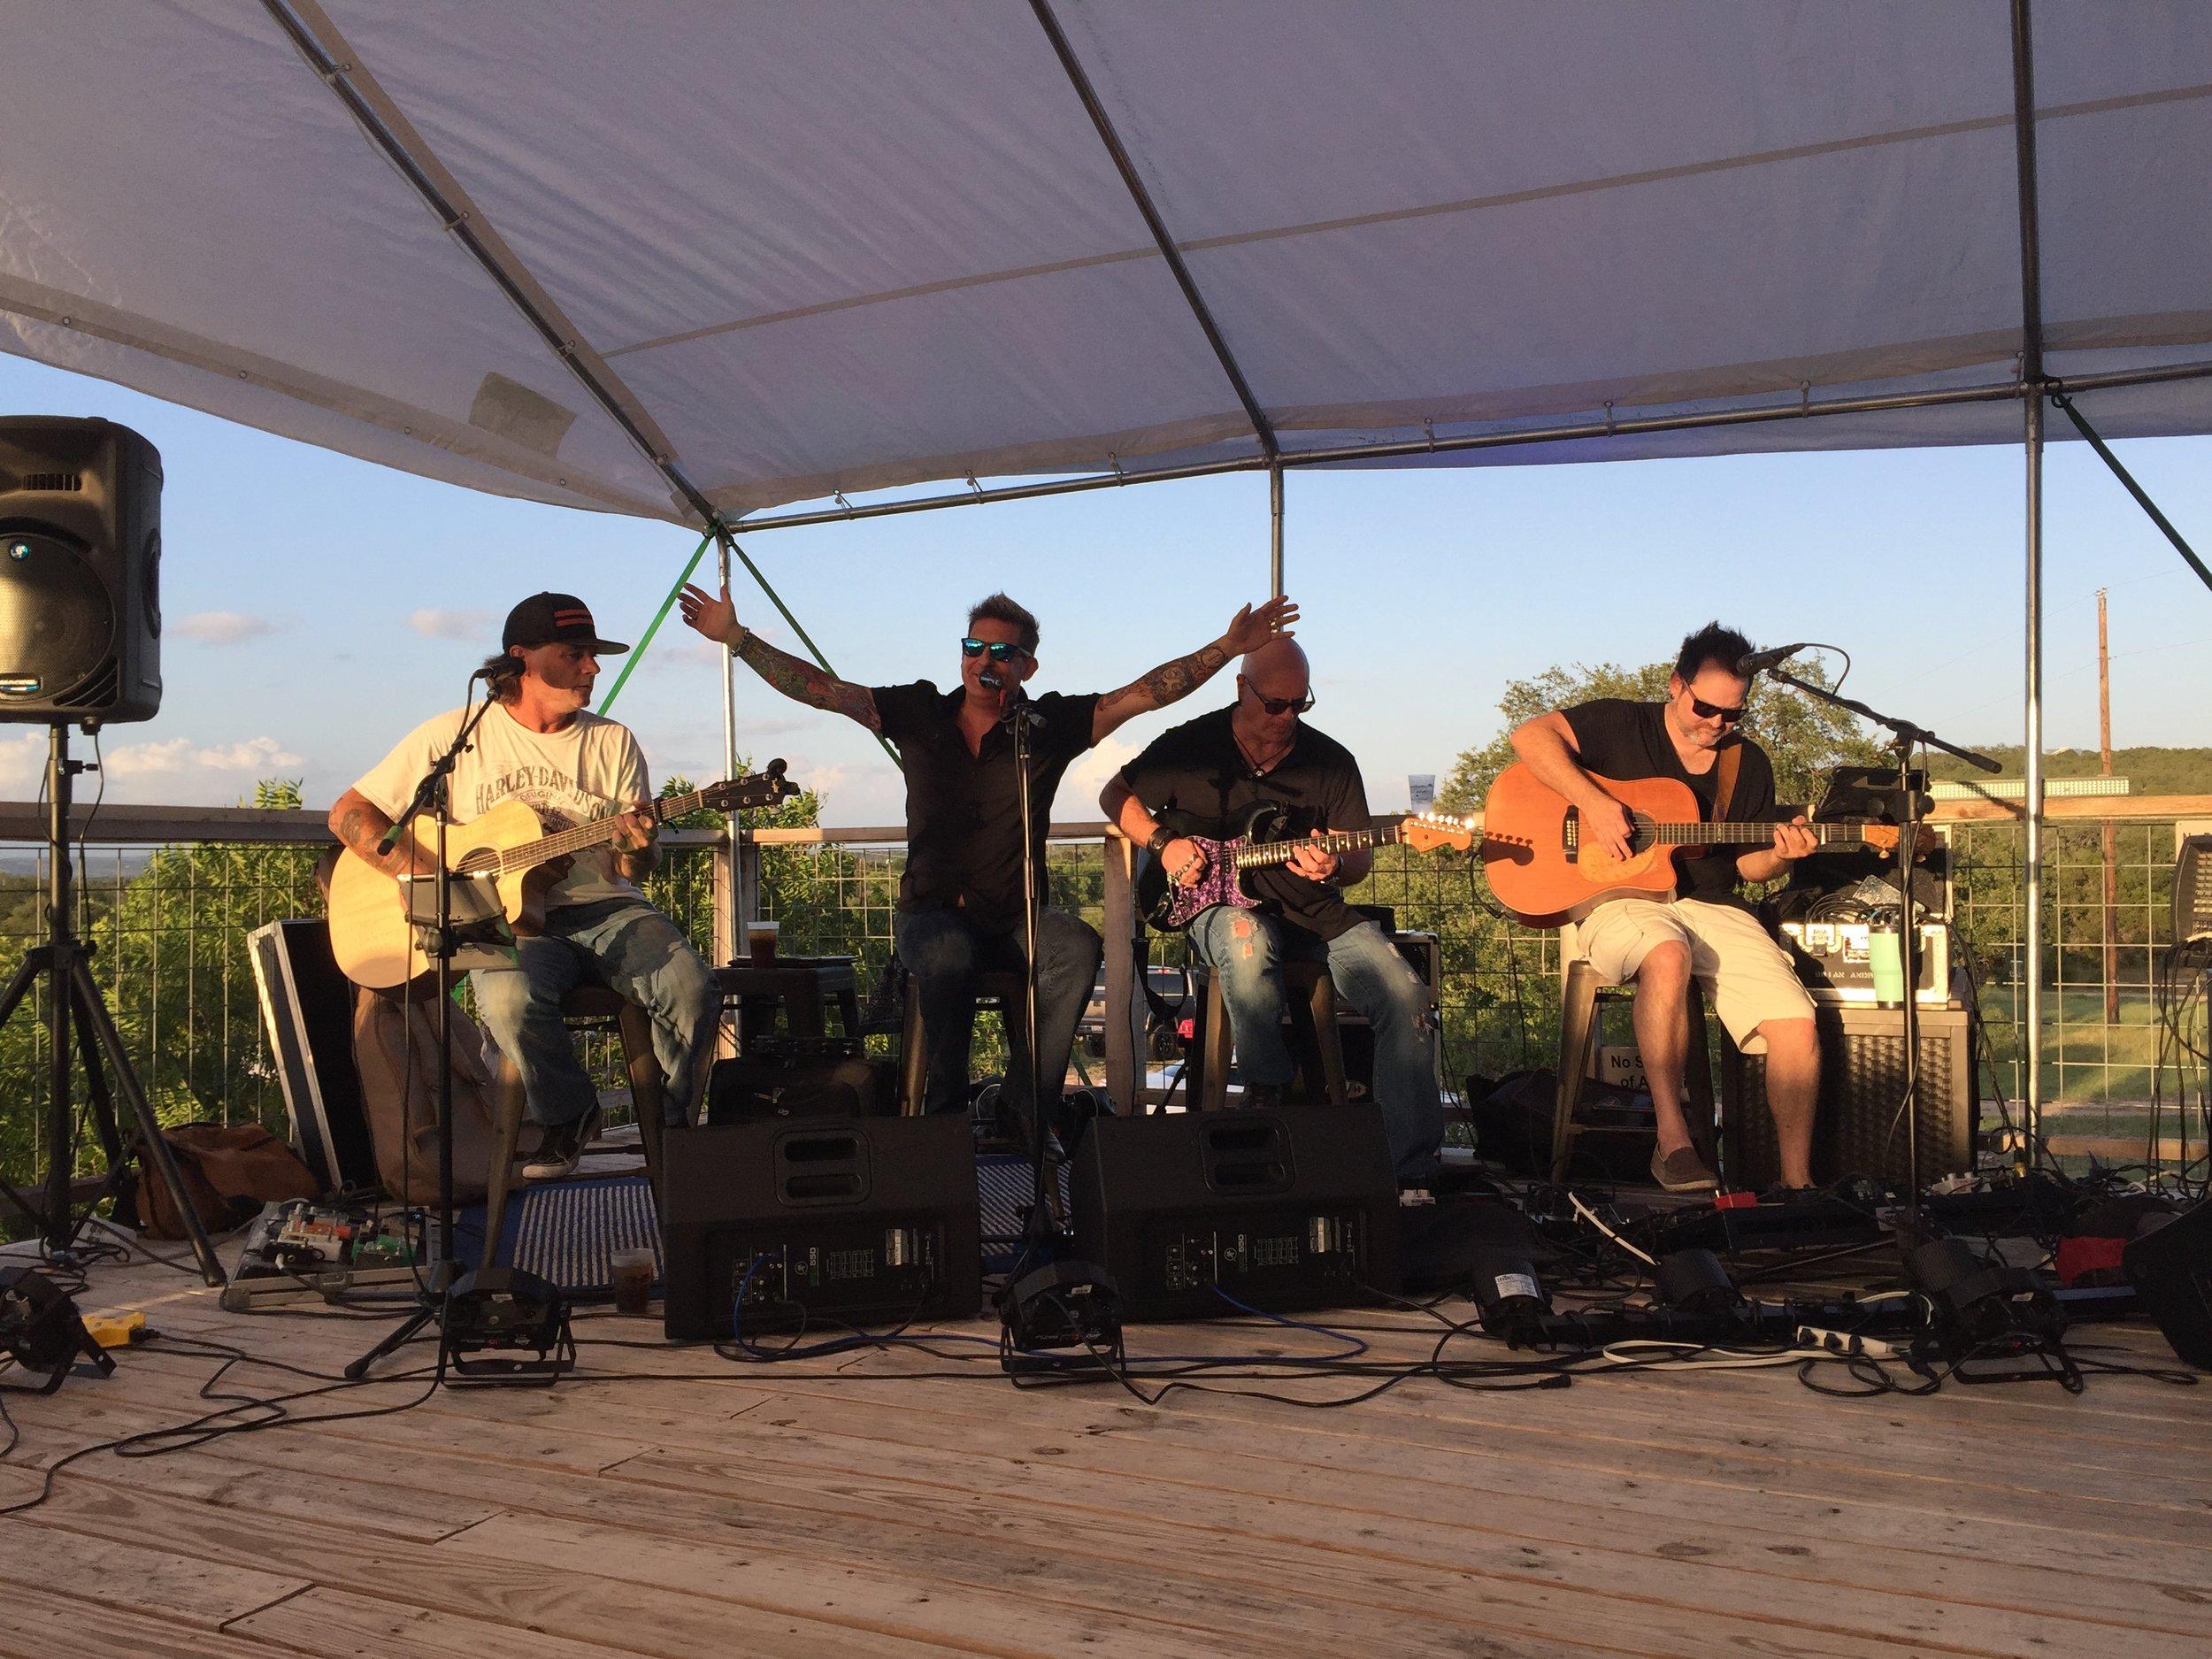 Robert Wagner and boys on the deck - Jun2018.jpeg